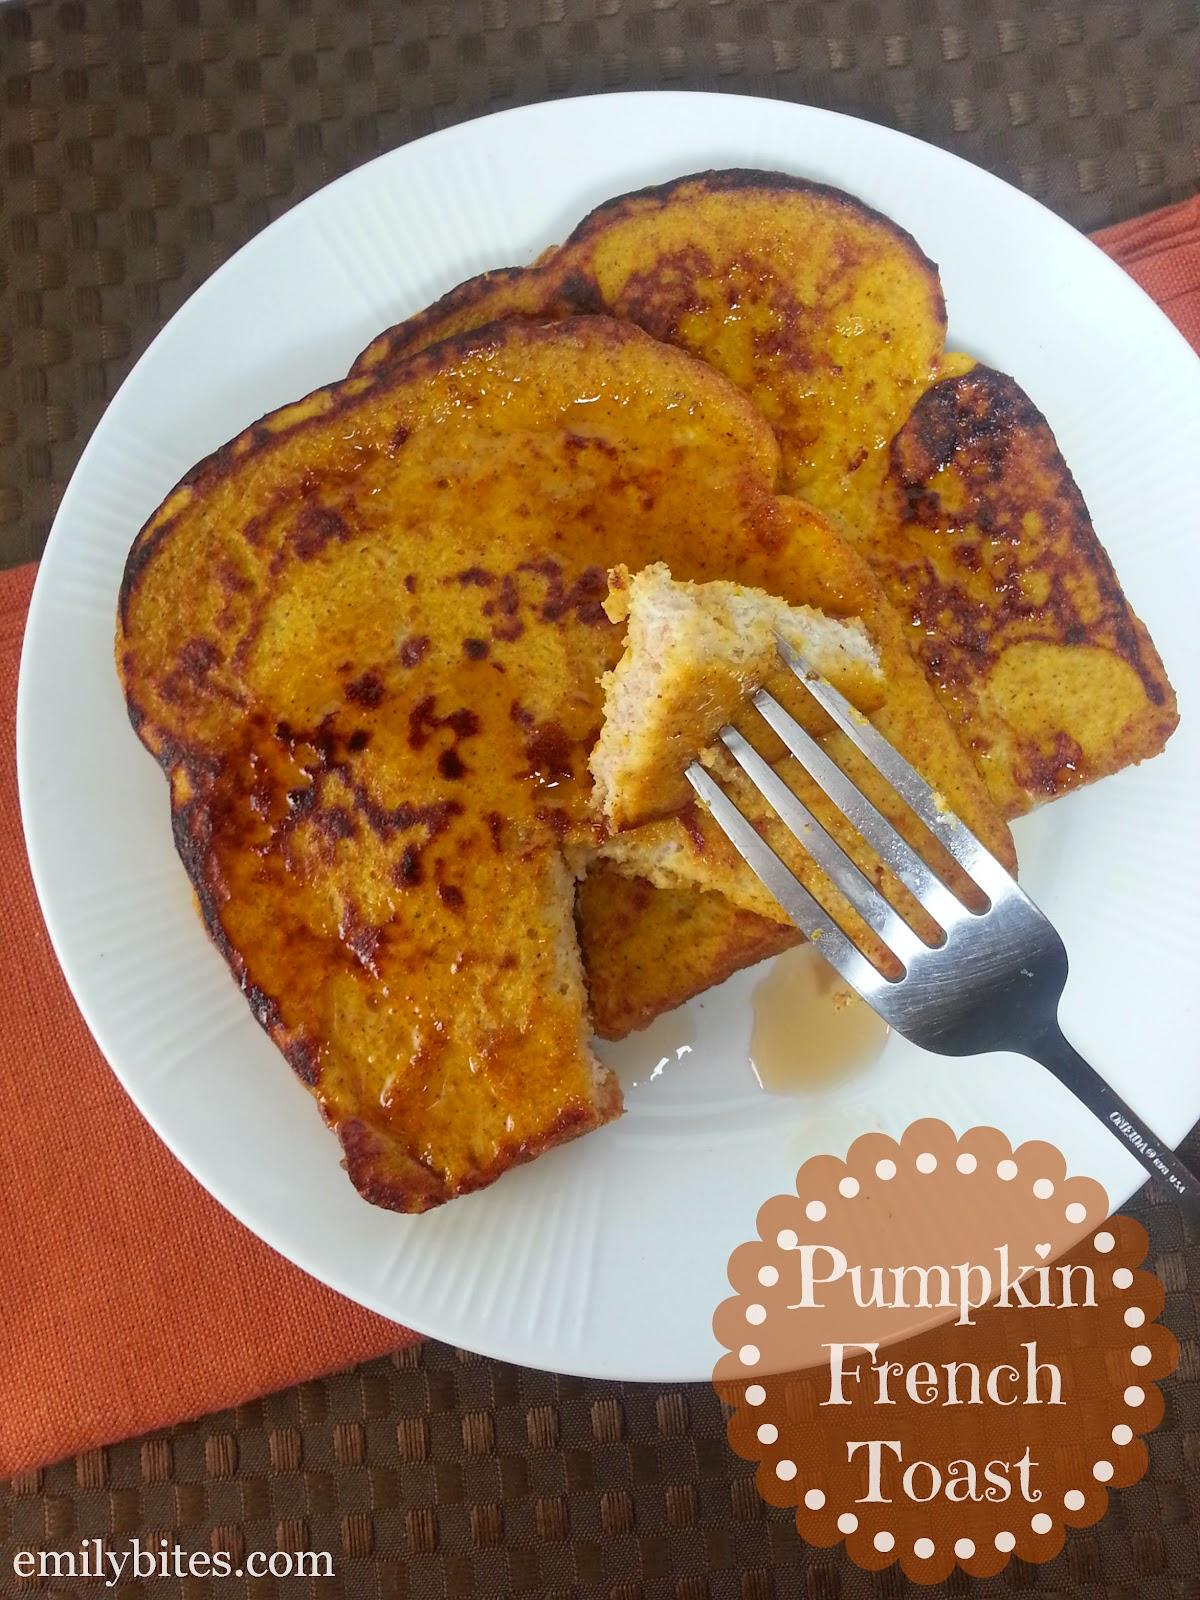 Pumpkin French Toast - Emily Bites